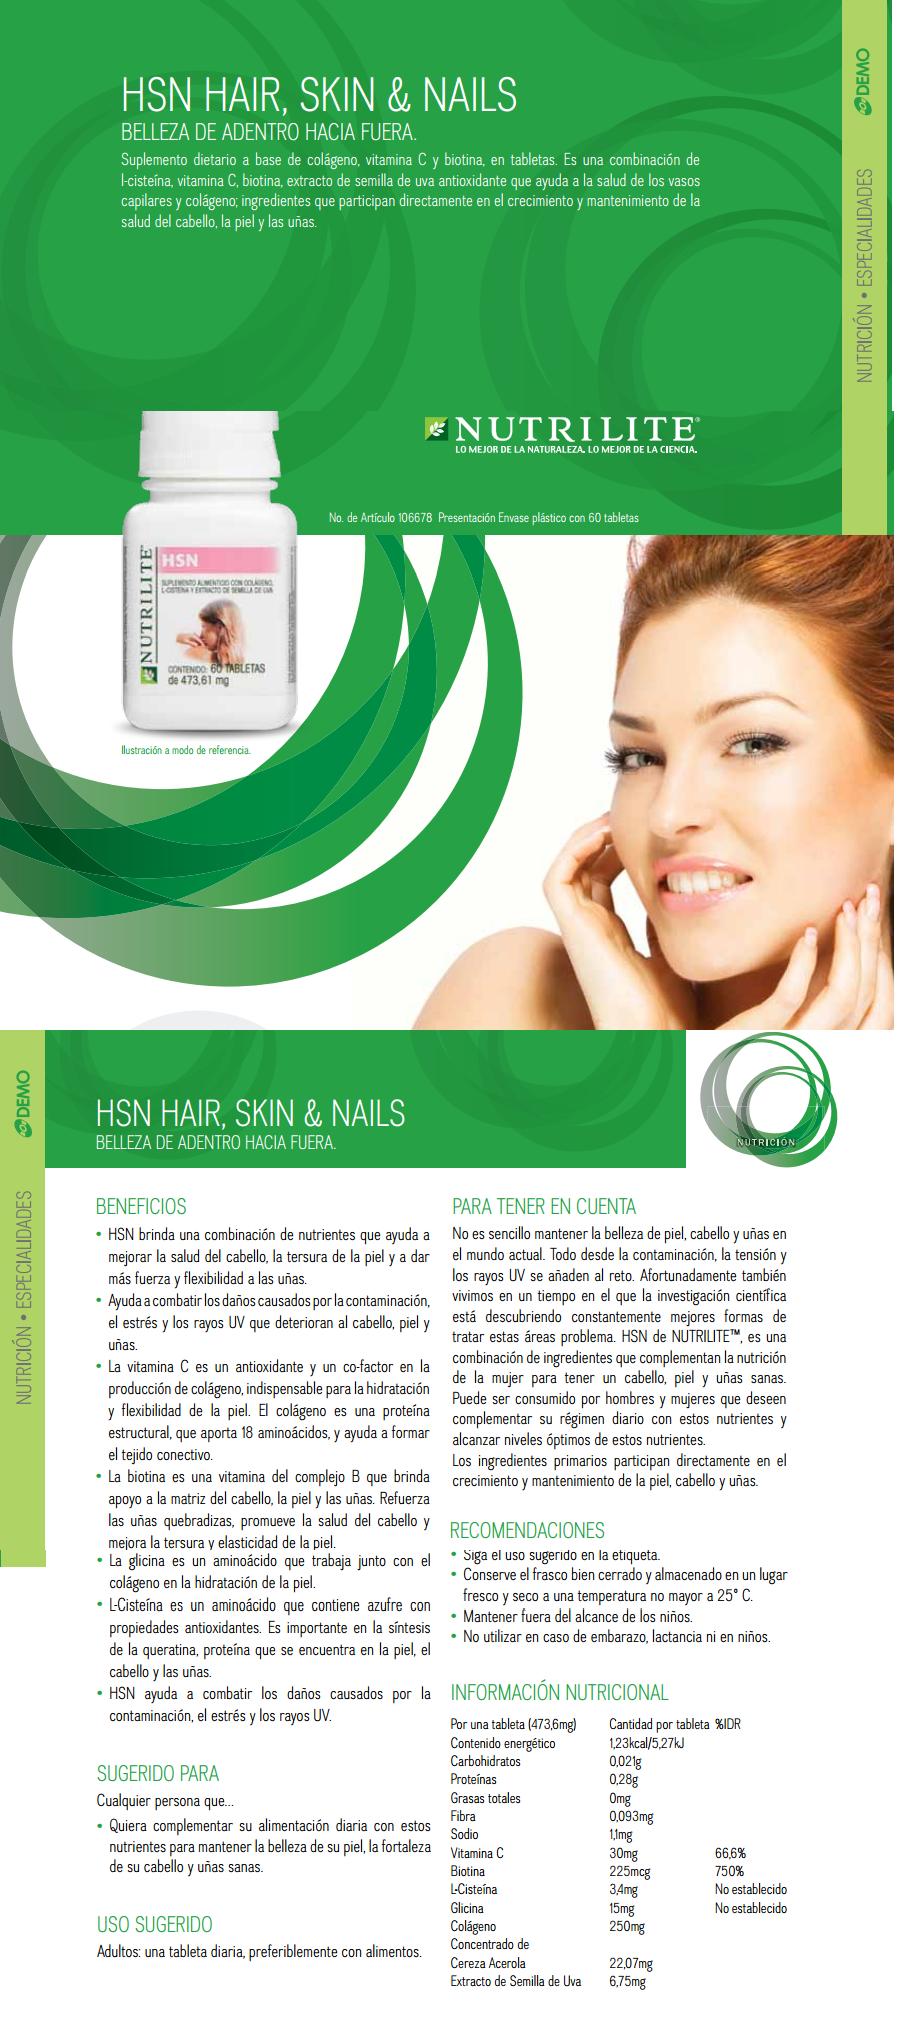 HSN Amway Nutrilite, HSN HSN contiene ingredientes que pueden ayudar ...